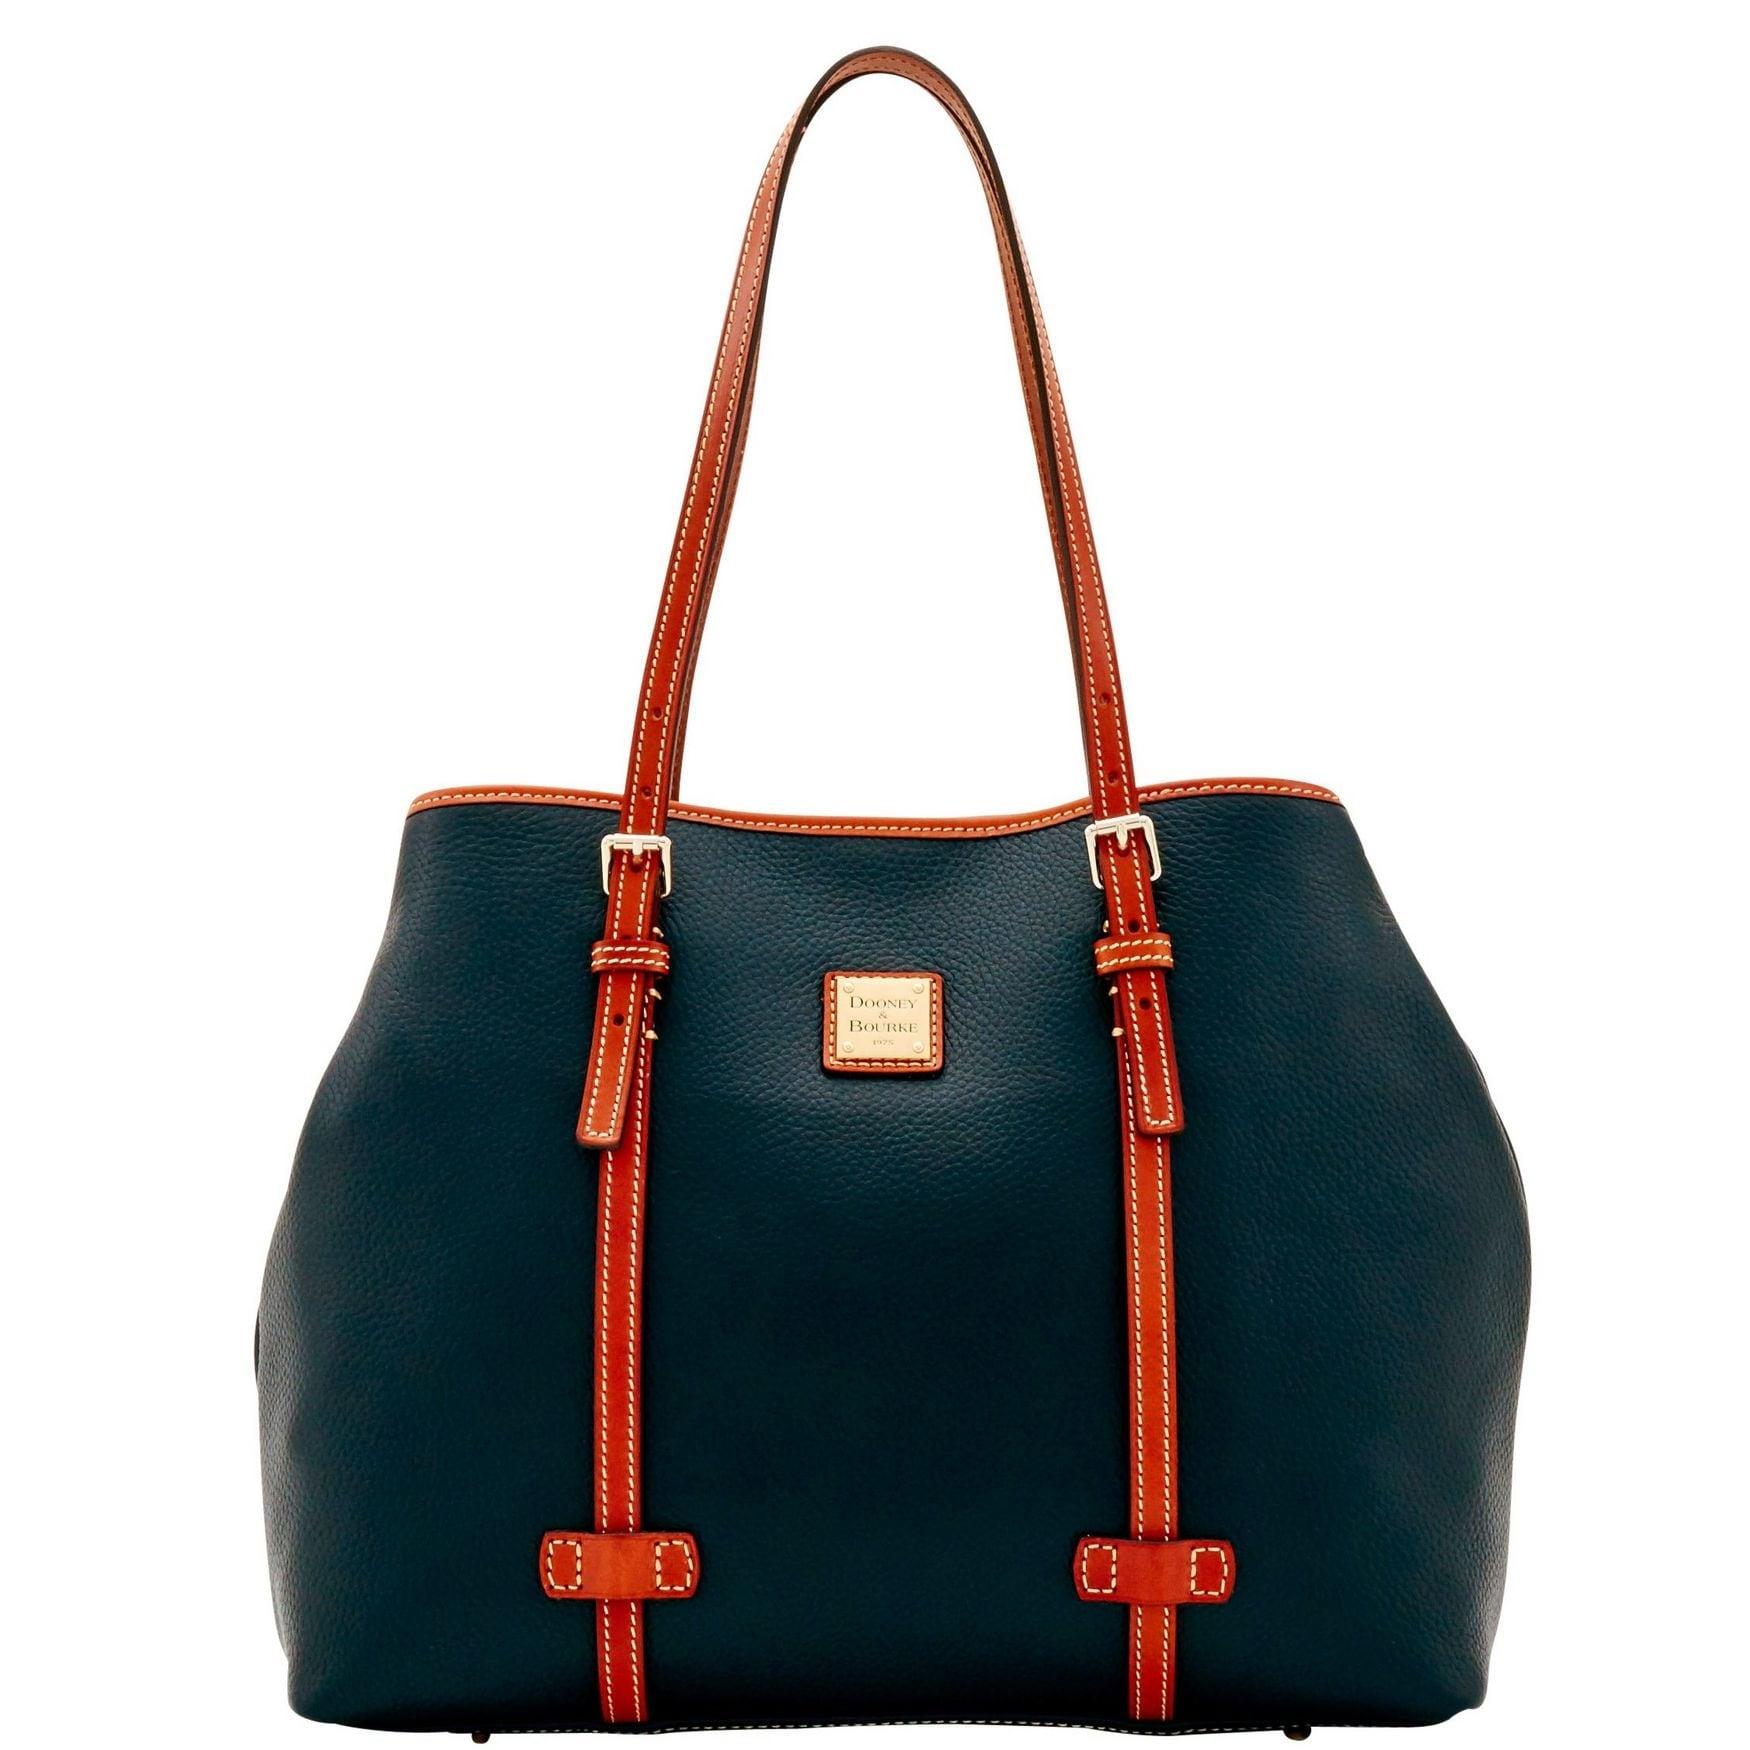 8ed06d189bba Designer Handbags | Find Great Designer Store Deals Shopping at Overstock